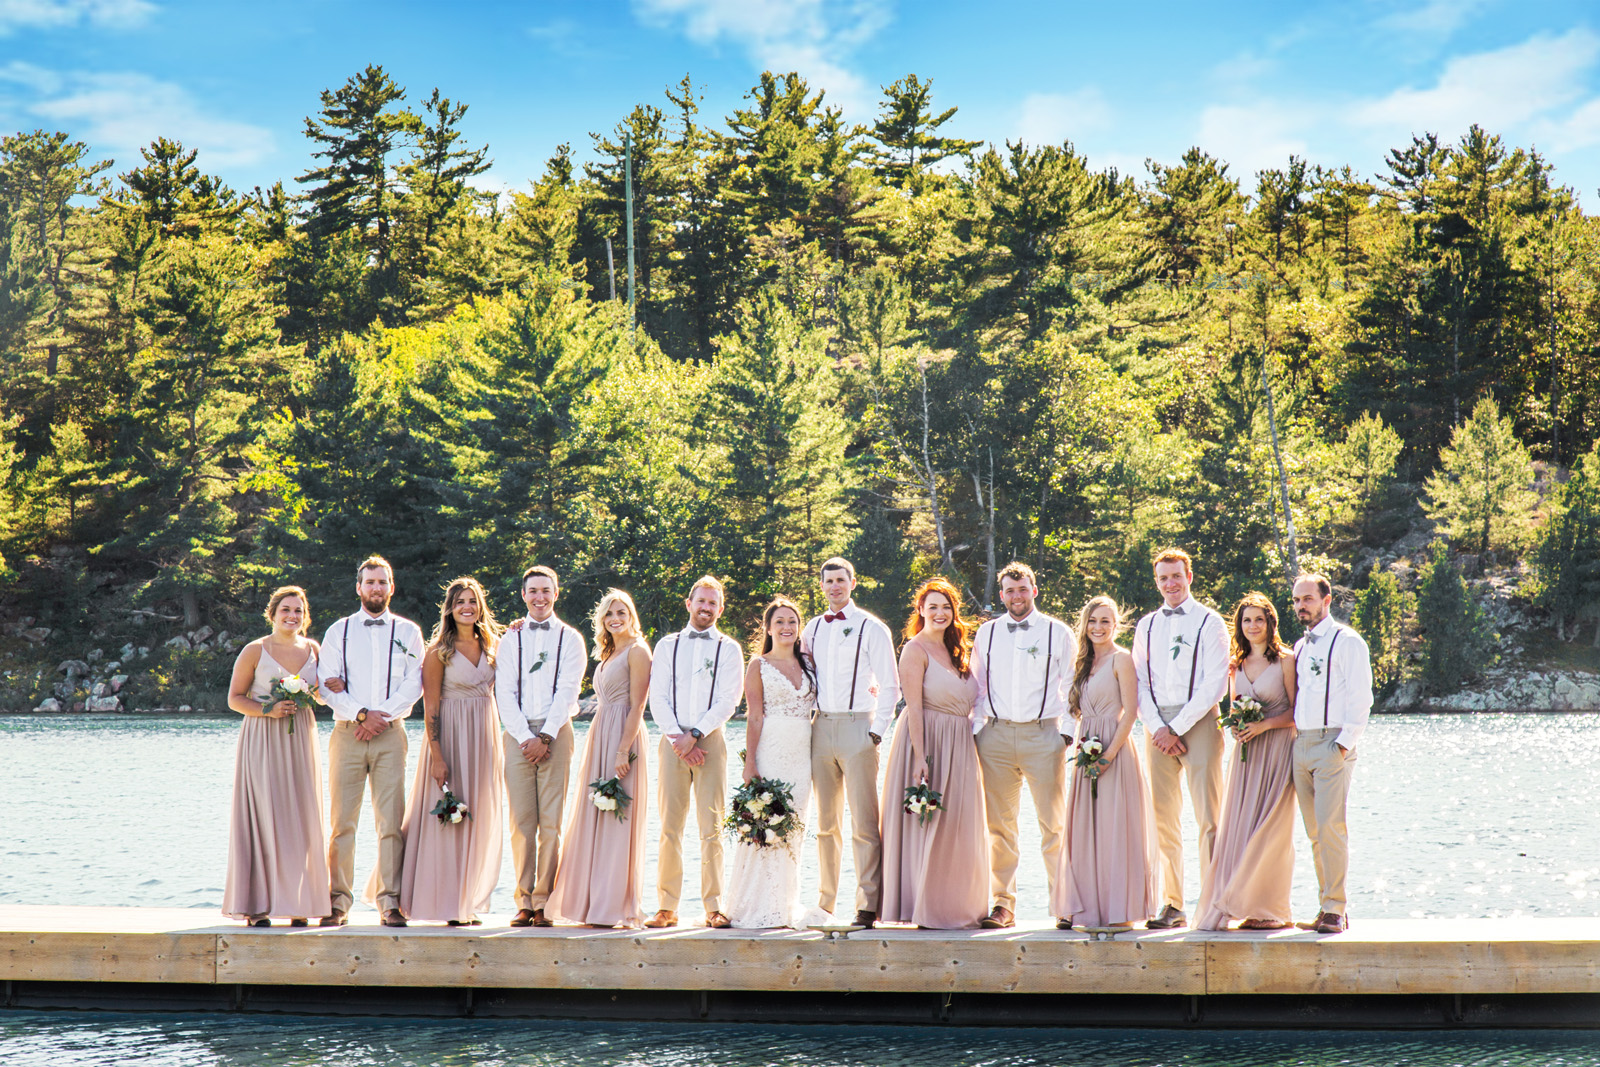 harris_wedding-2020.jpg